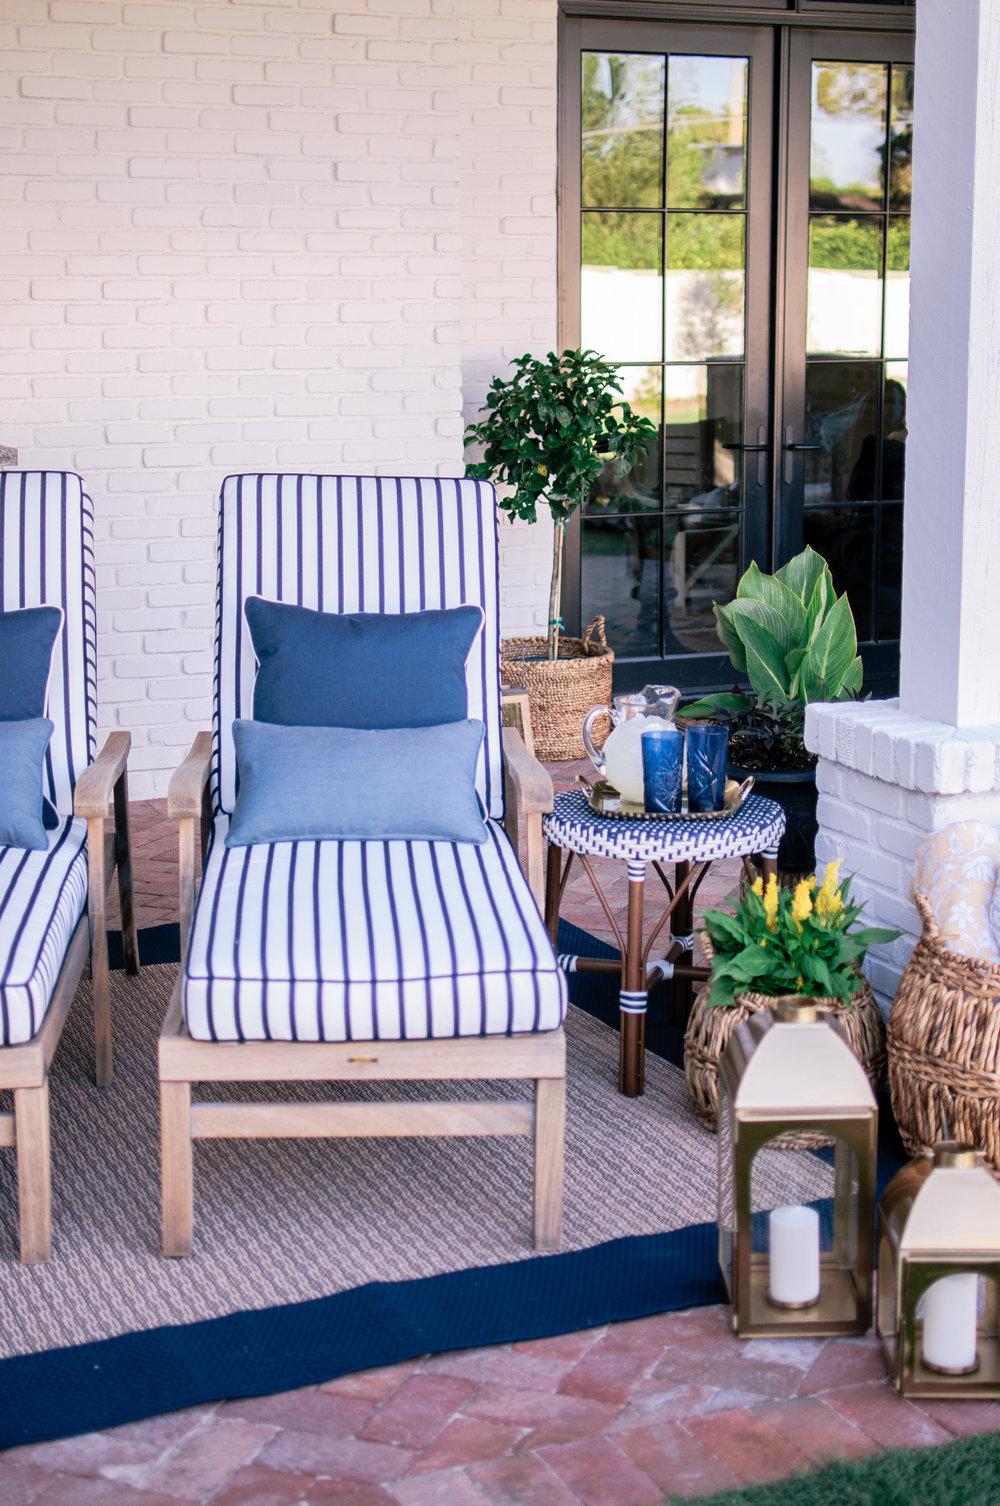 Small Backyard Patio Makeover on a Budget